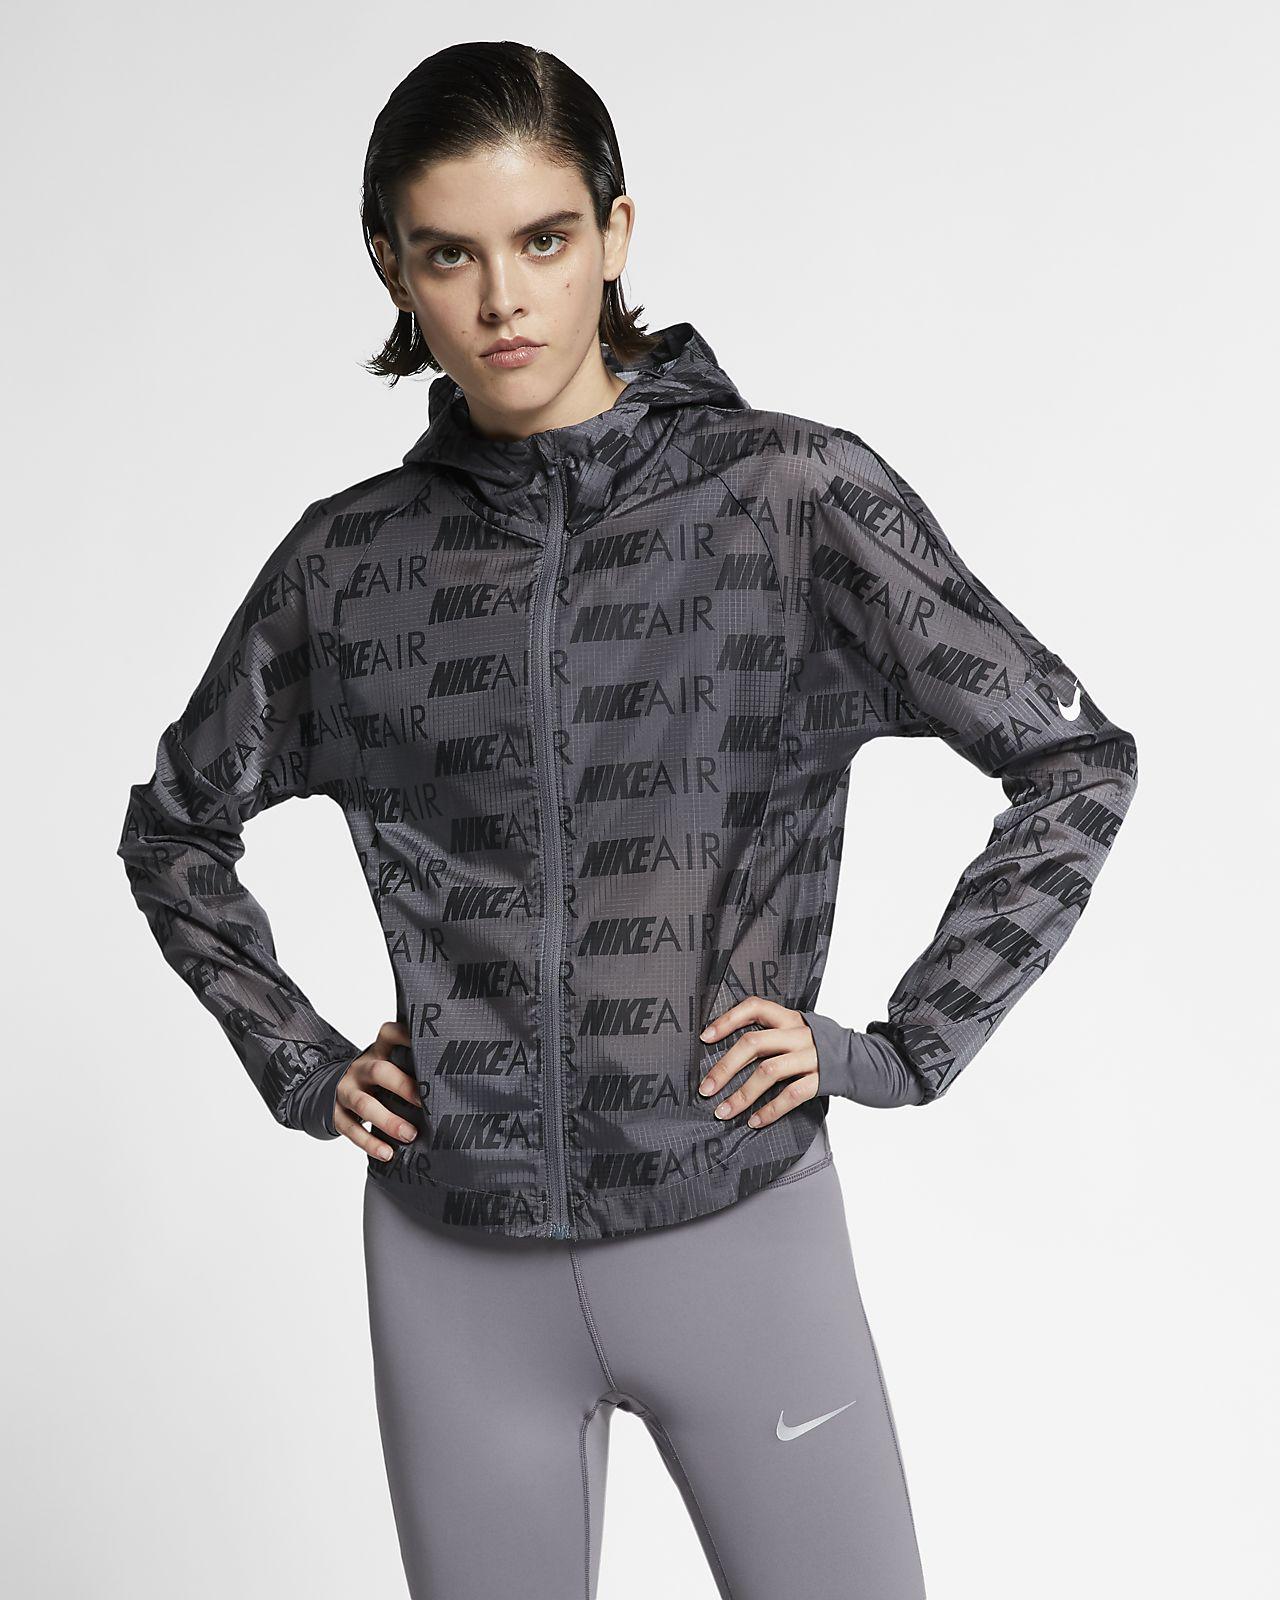 Nike Air Chaqueta de running con capucha - Mujer